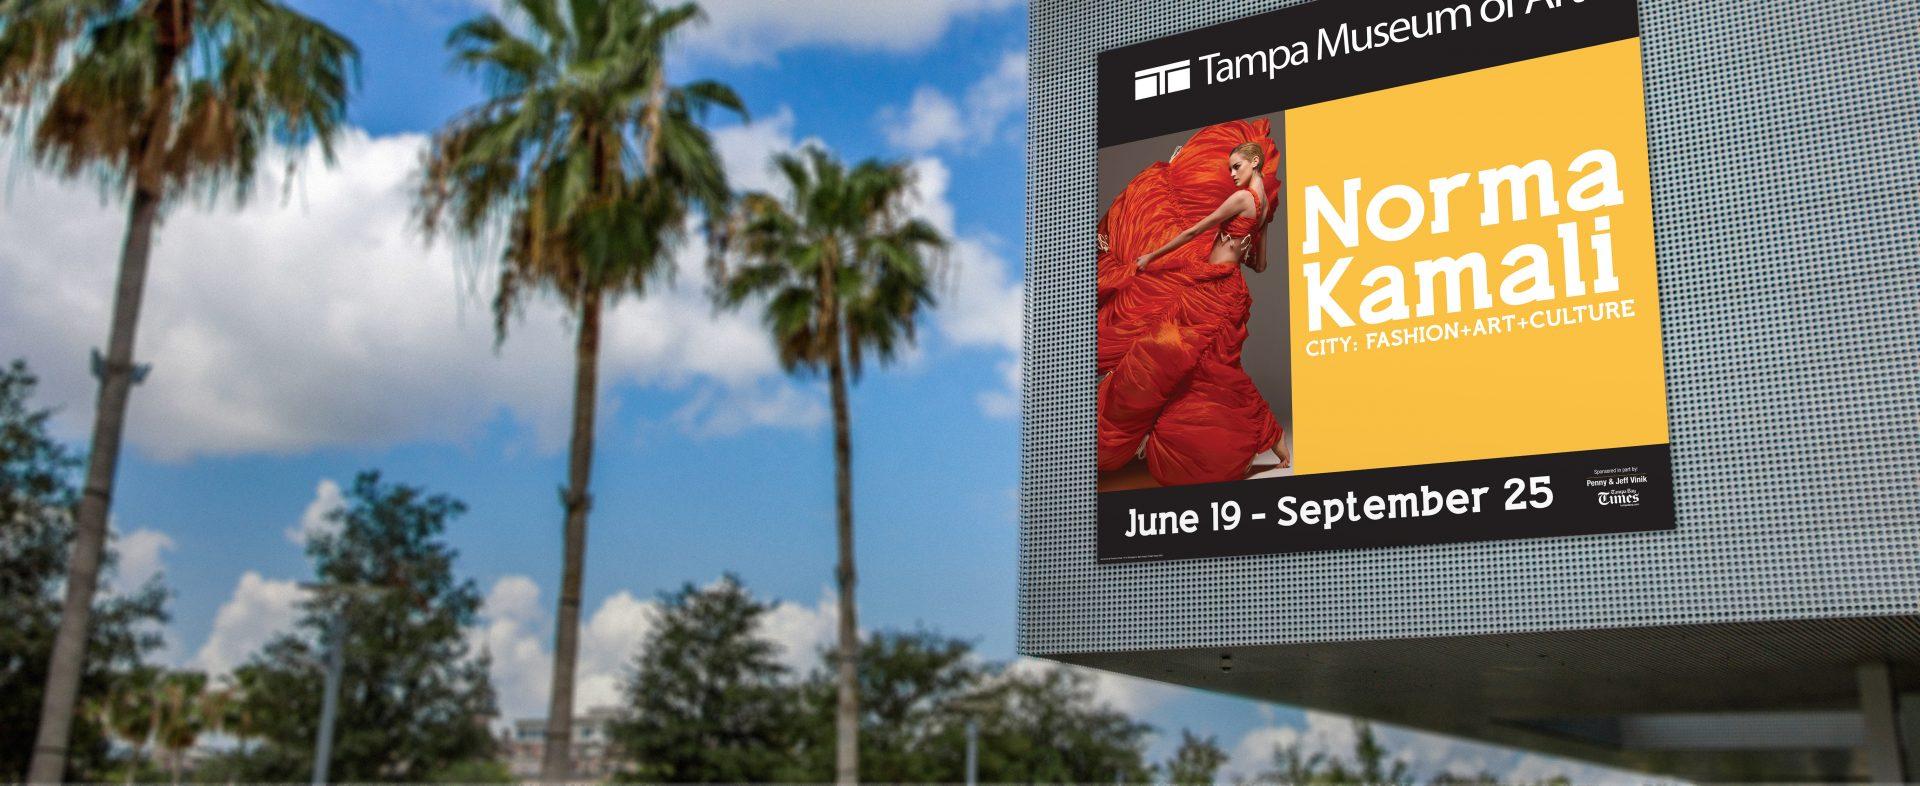 Tampa Museum of Art Branding and Advertising